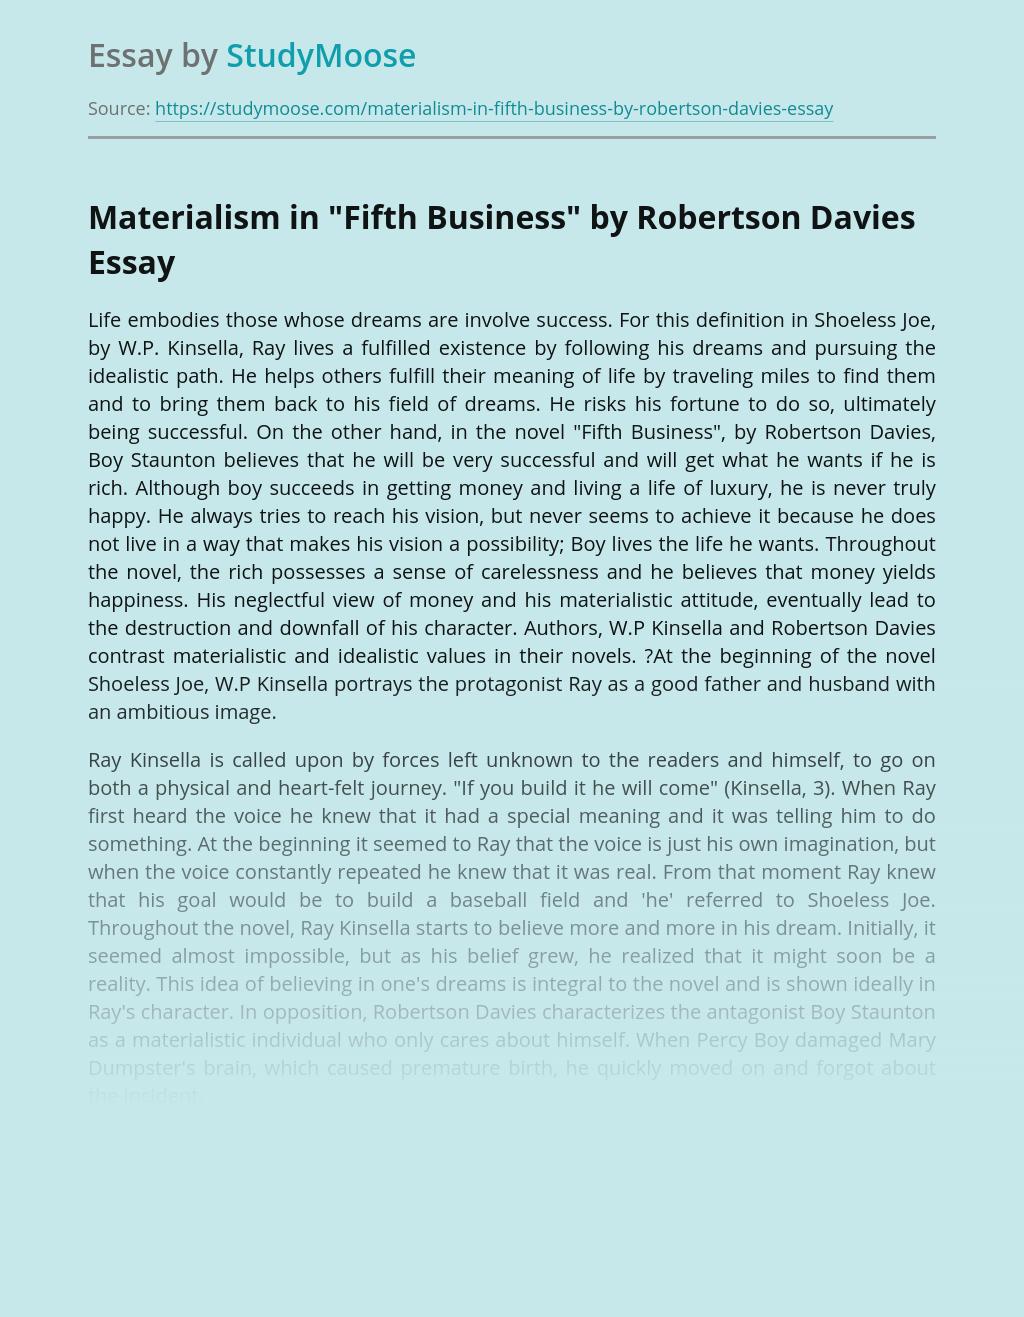 Materialism in